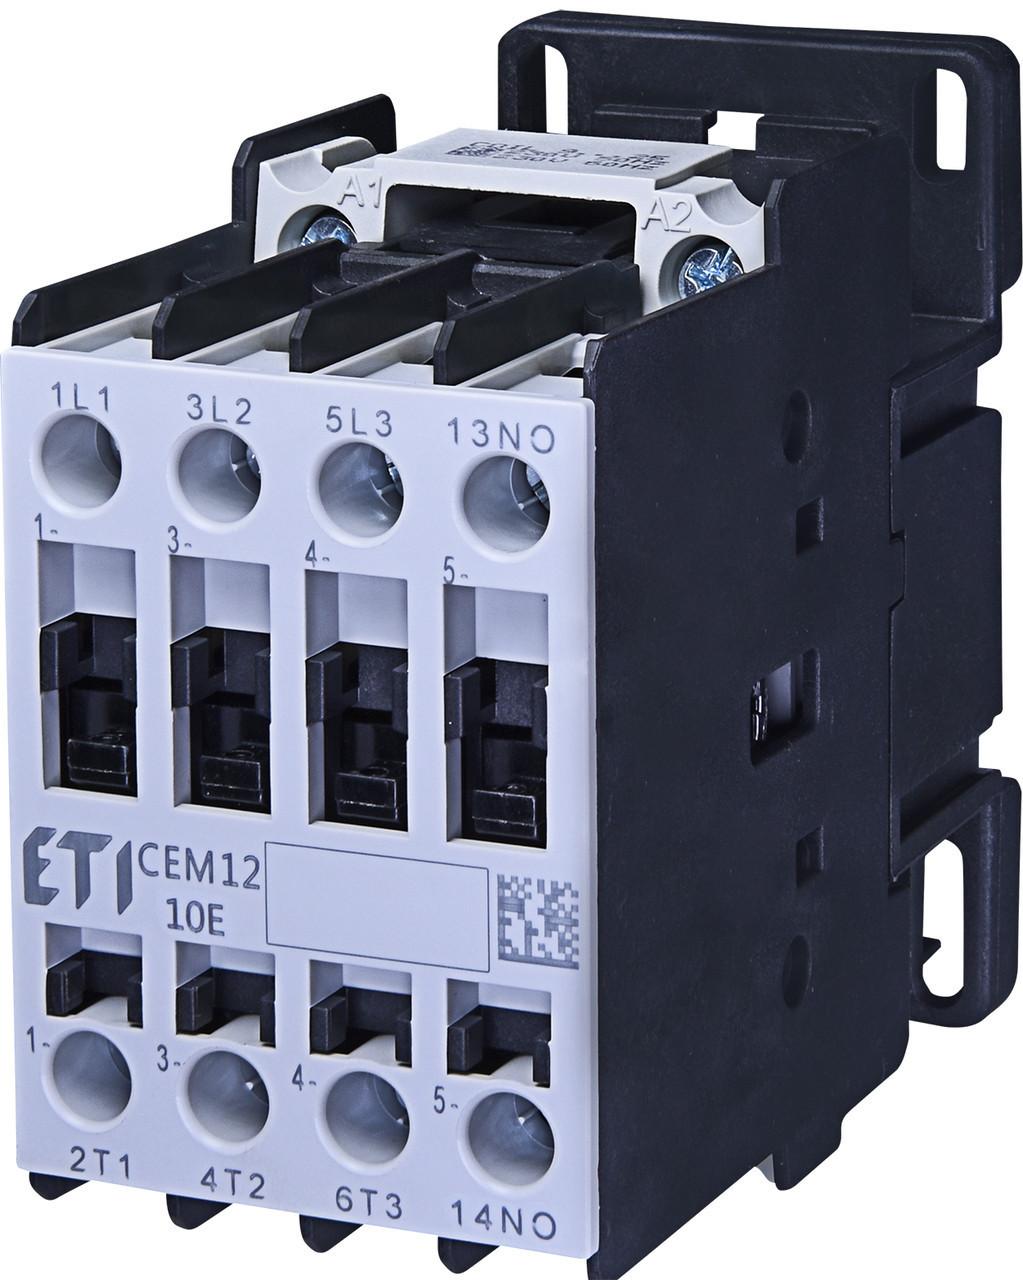 Контактор силовой ETI CEM 12.01 12А 230V AC 3NO+1NC 5.5kW 4643113 (на DIN-рейку, 25A AC1, 12A AC3)